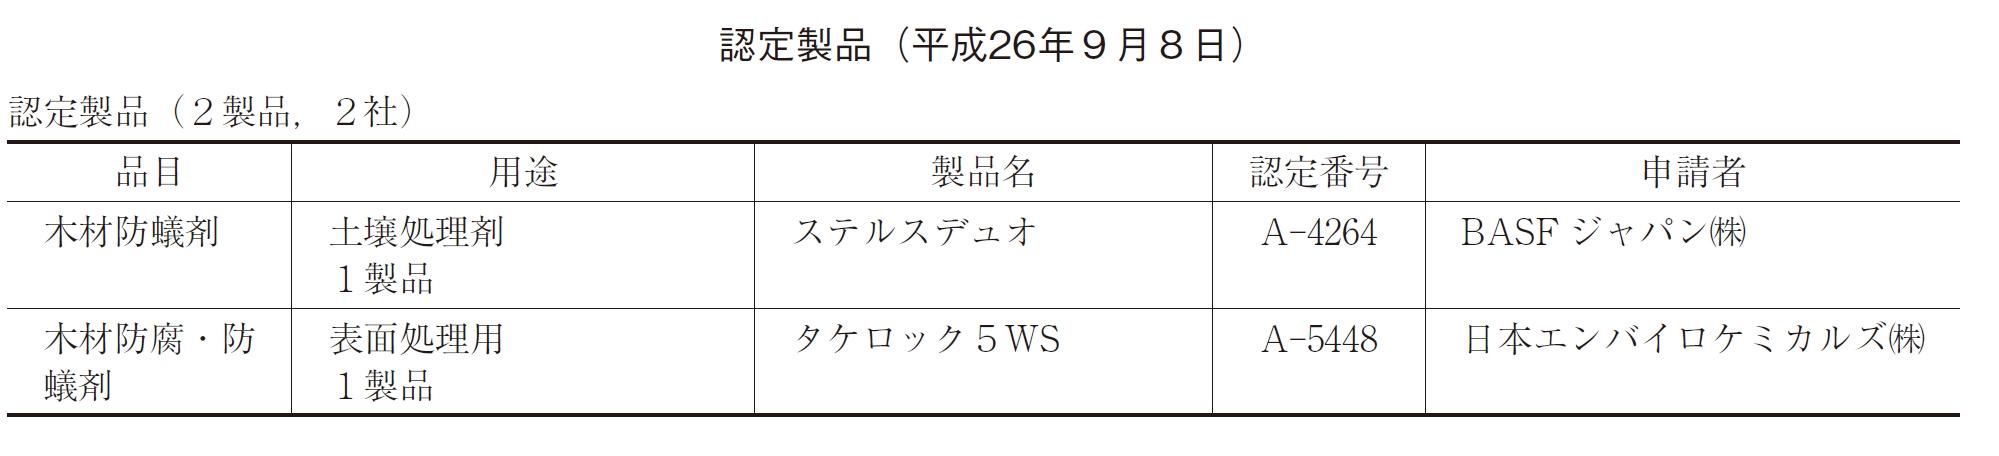 http://www.mokuzaihozon.org/about/jwpa_news/WS000002.JPG